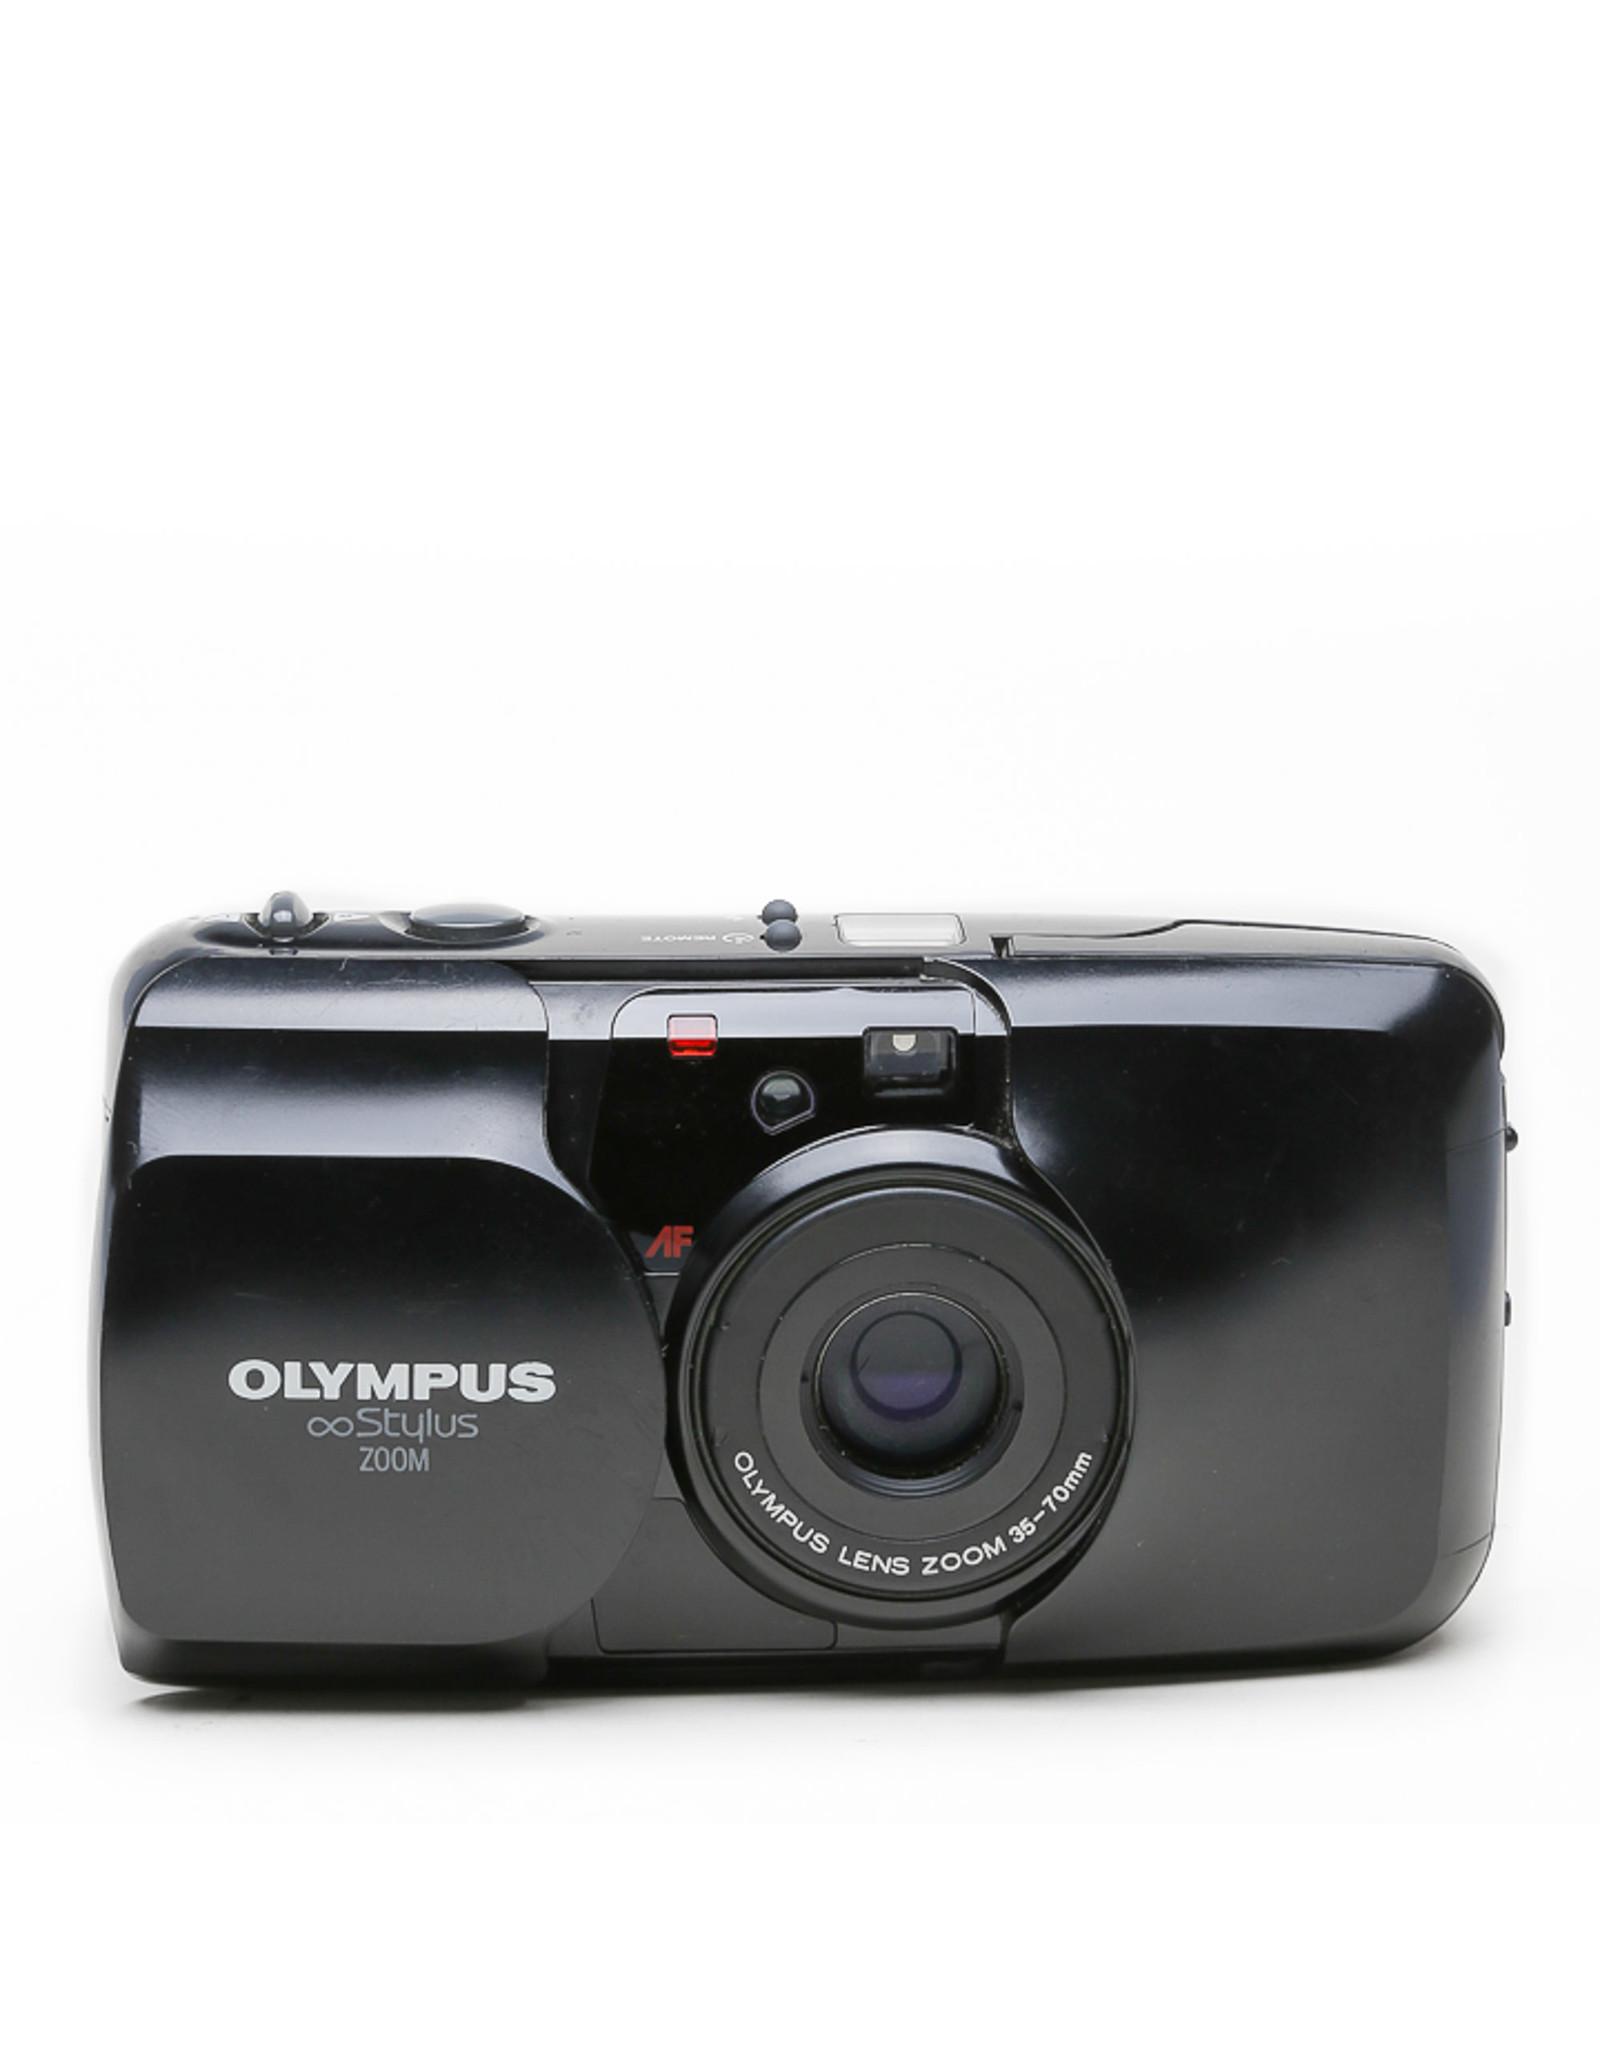 Olympus Olympus Stylus Zoom Point & Shoot Camera